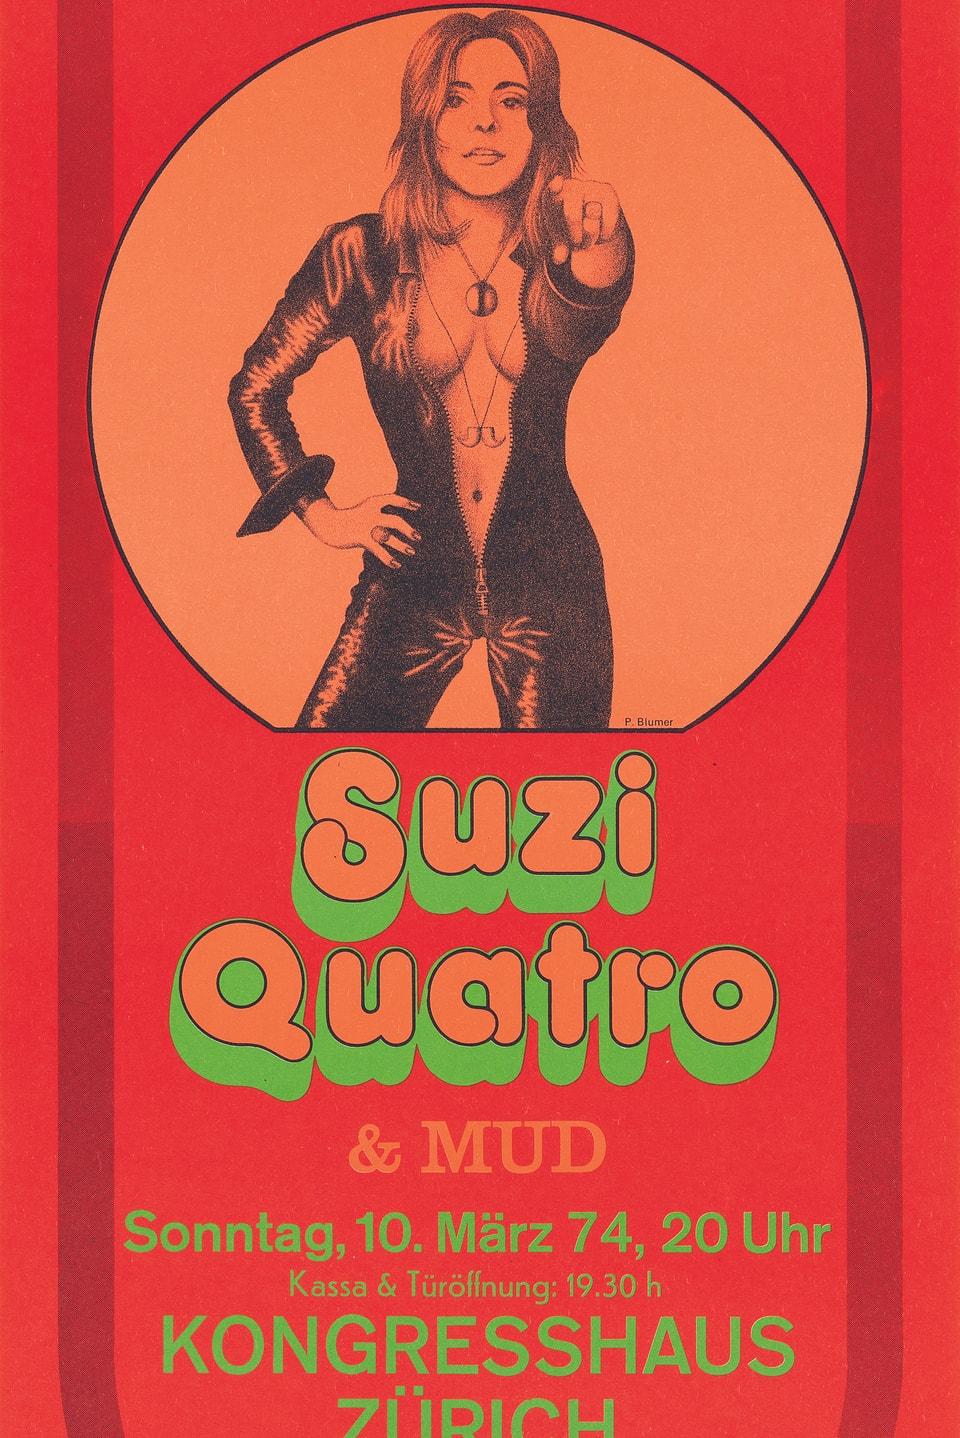 Konzertplakat von Suzi Quatro